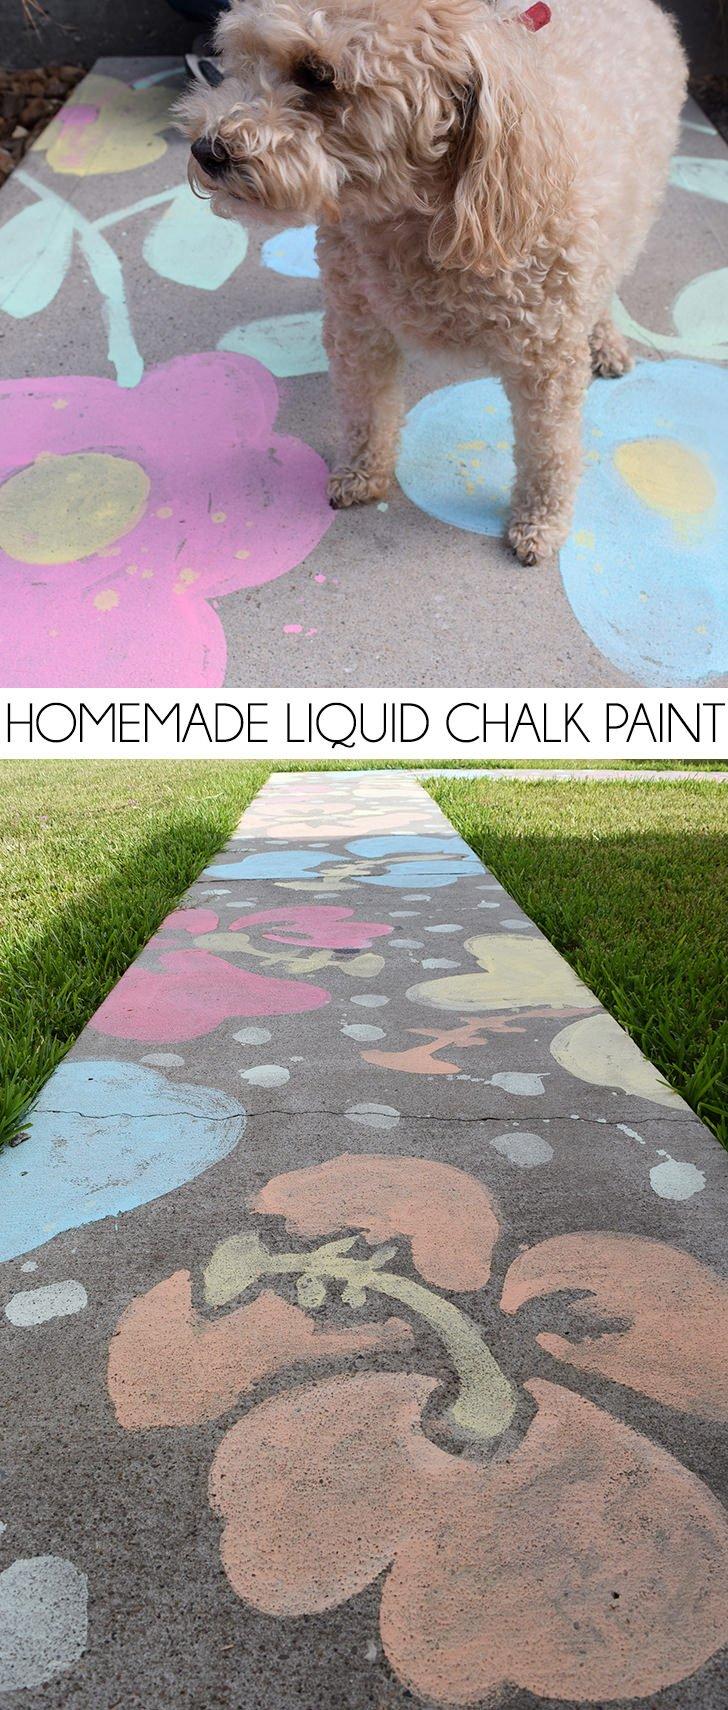 Homemade Liquid Chalk Paint